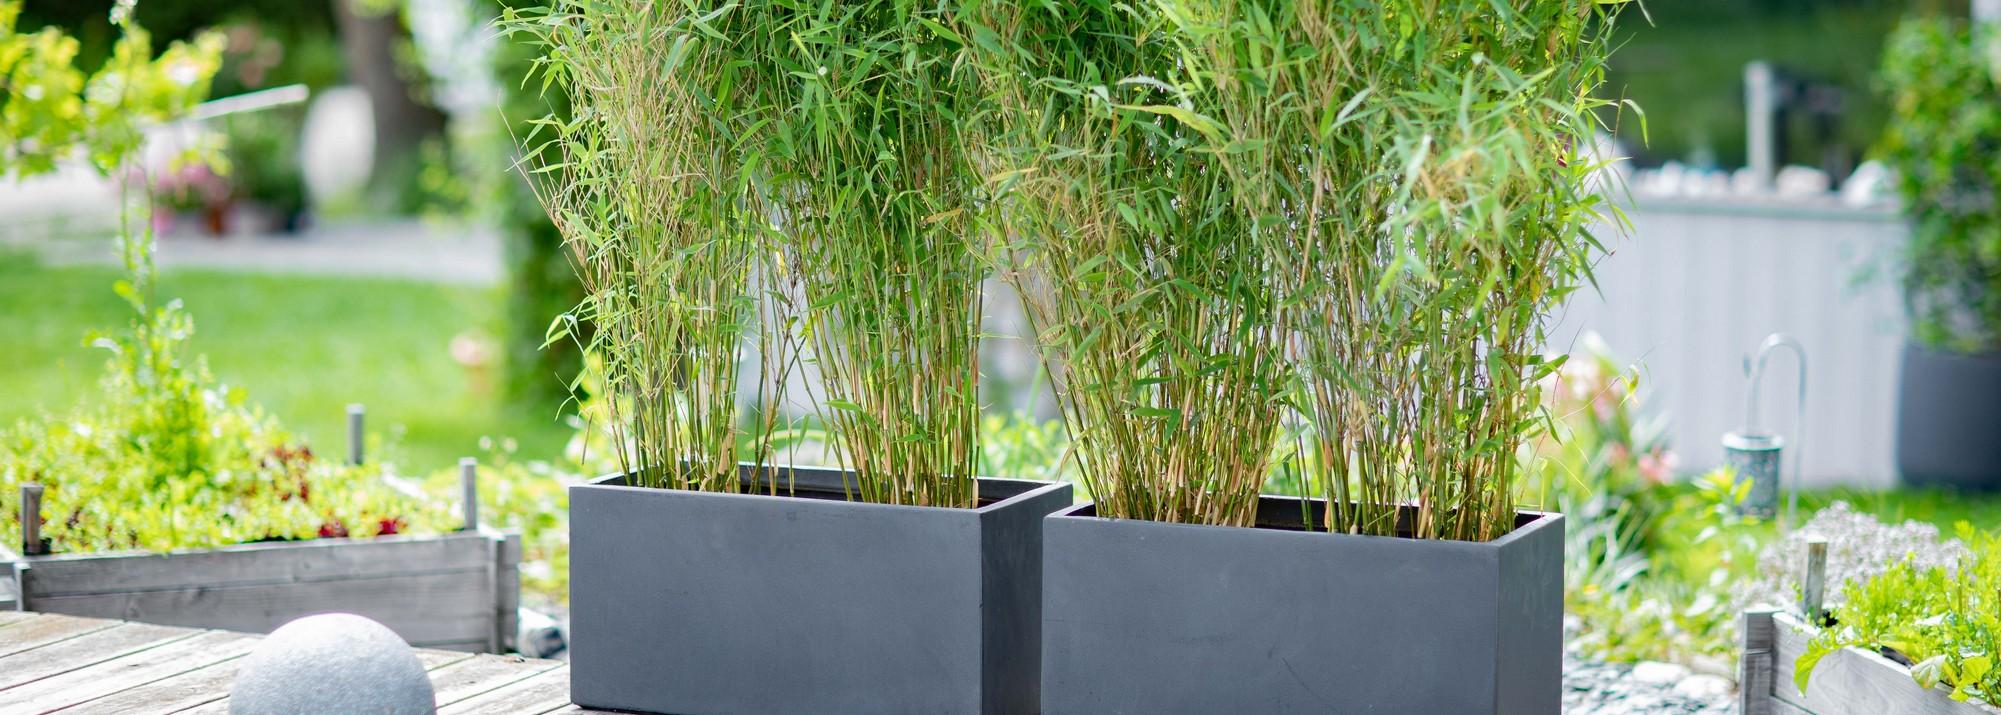 Quelle Plante En Pot Pour Terrasse bambou pour balcon et terrasse : botanic®, bambou fargesia